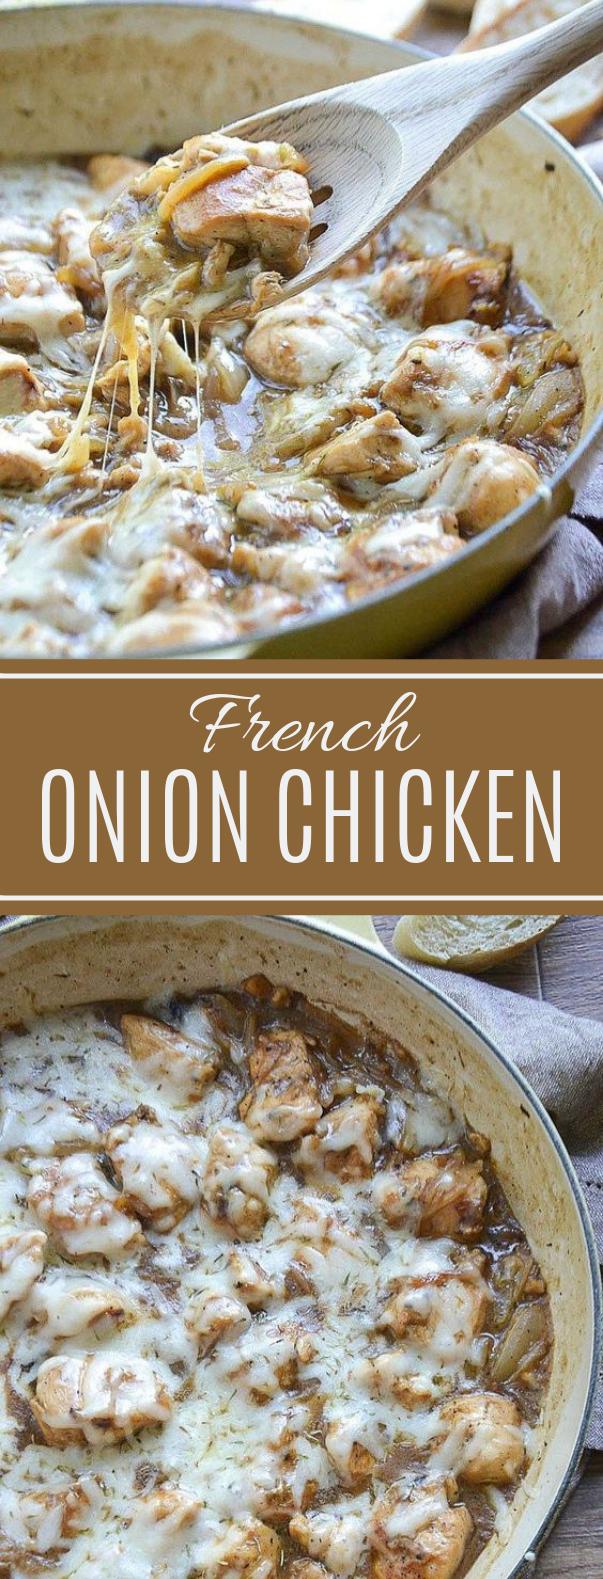 French Onion Chicken #maindish #dinner